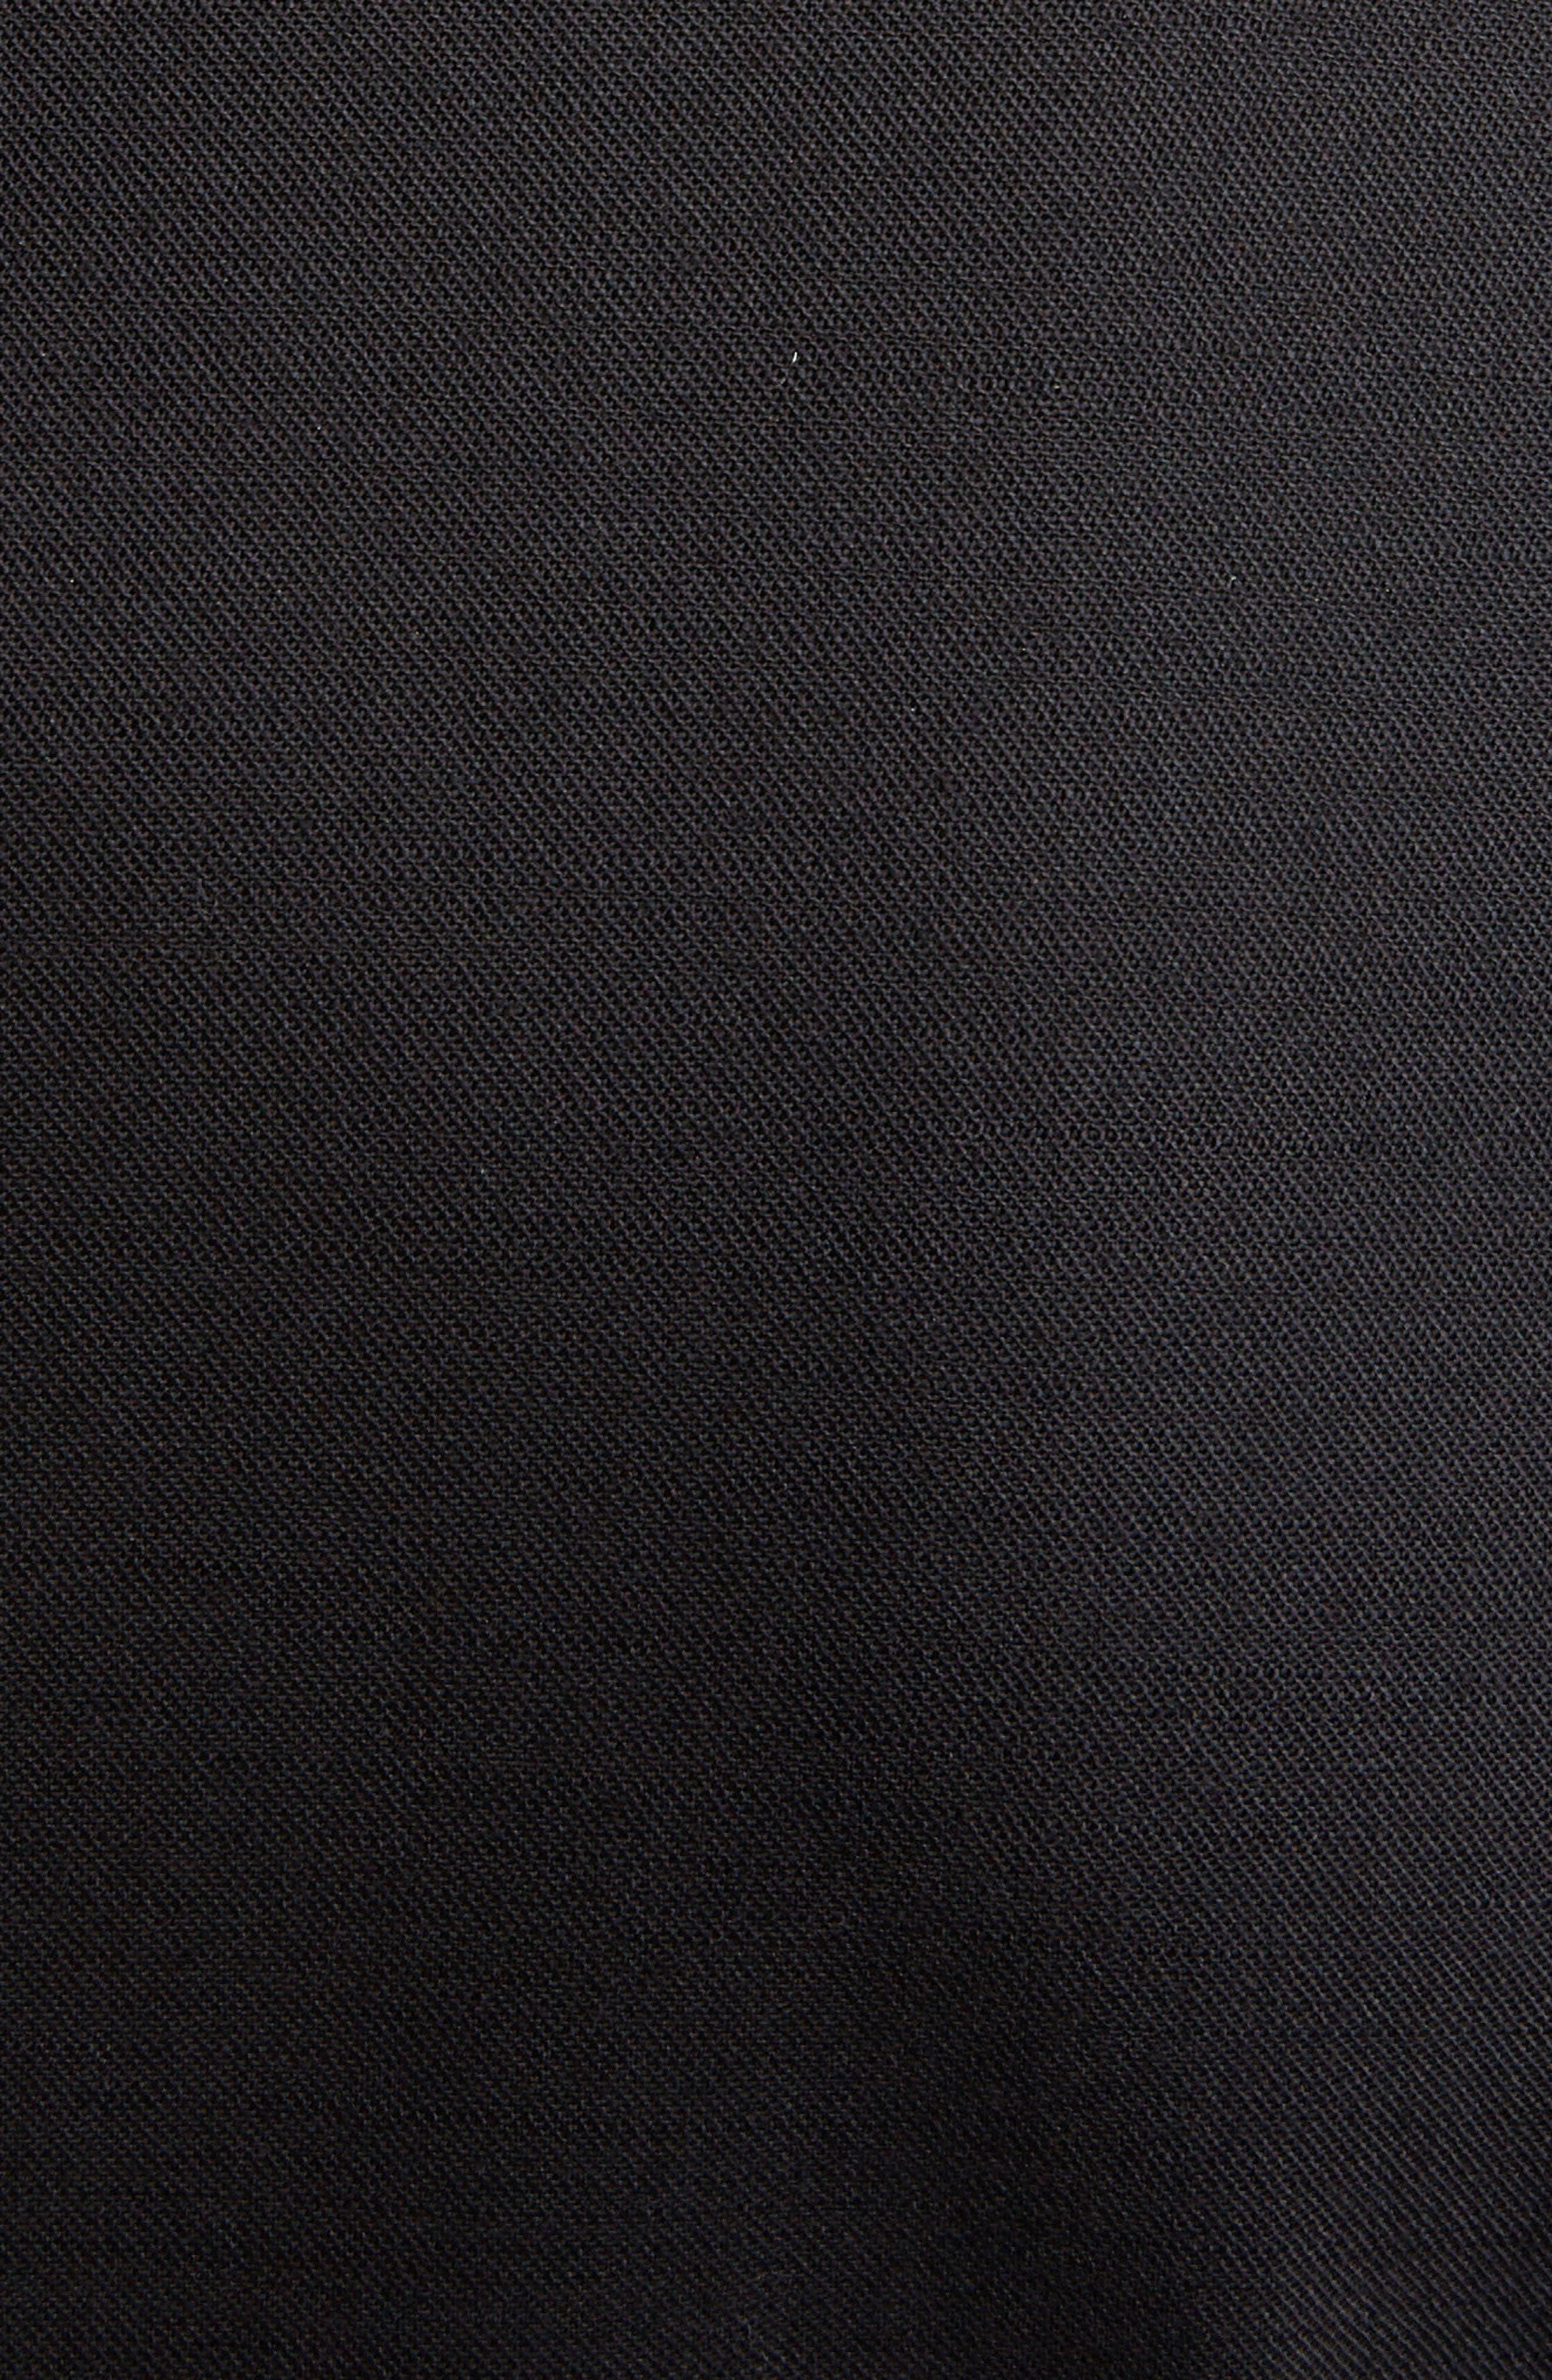 SIMONE ROCHA,                             Marabou Trim Double Breasted Stretch Wool Jacket,                             Alternate thumbnail 5, color,                             BLACK